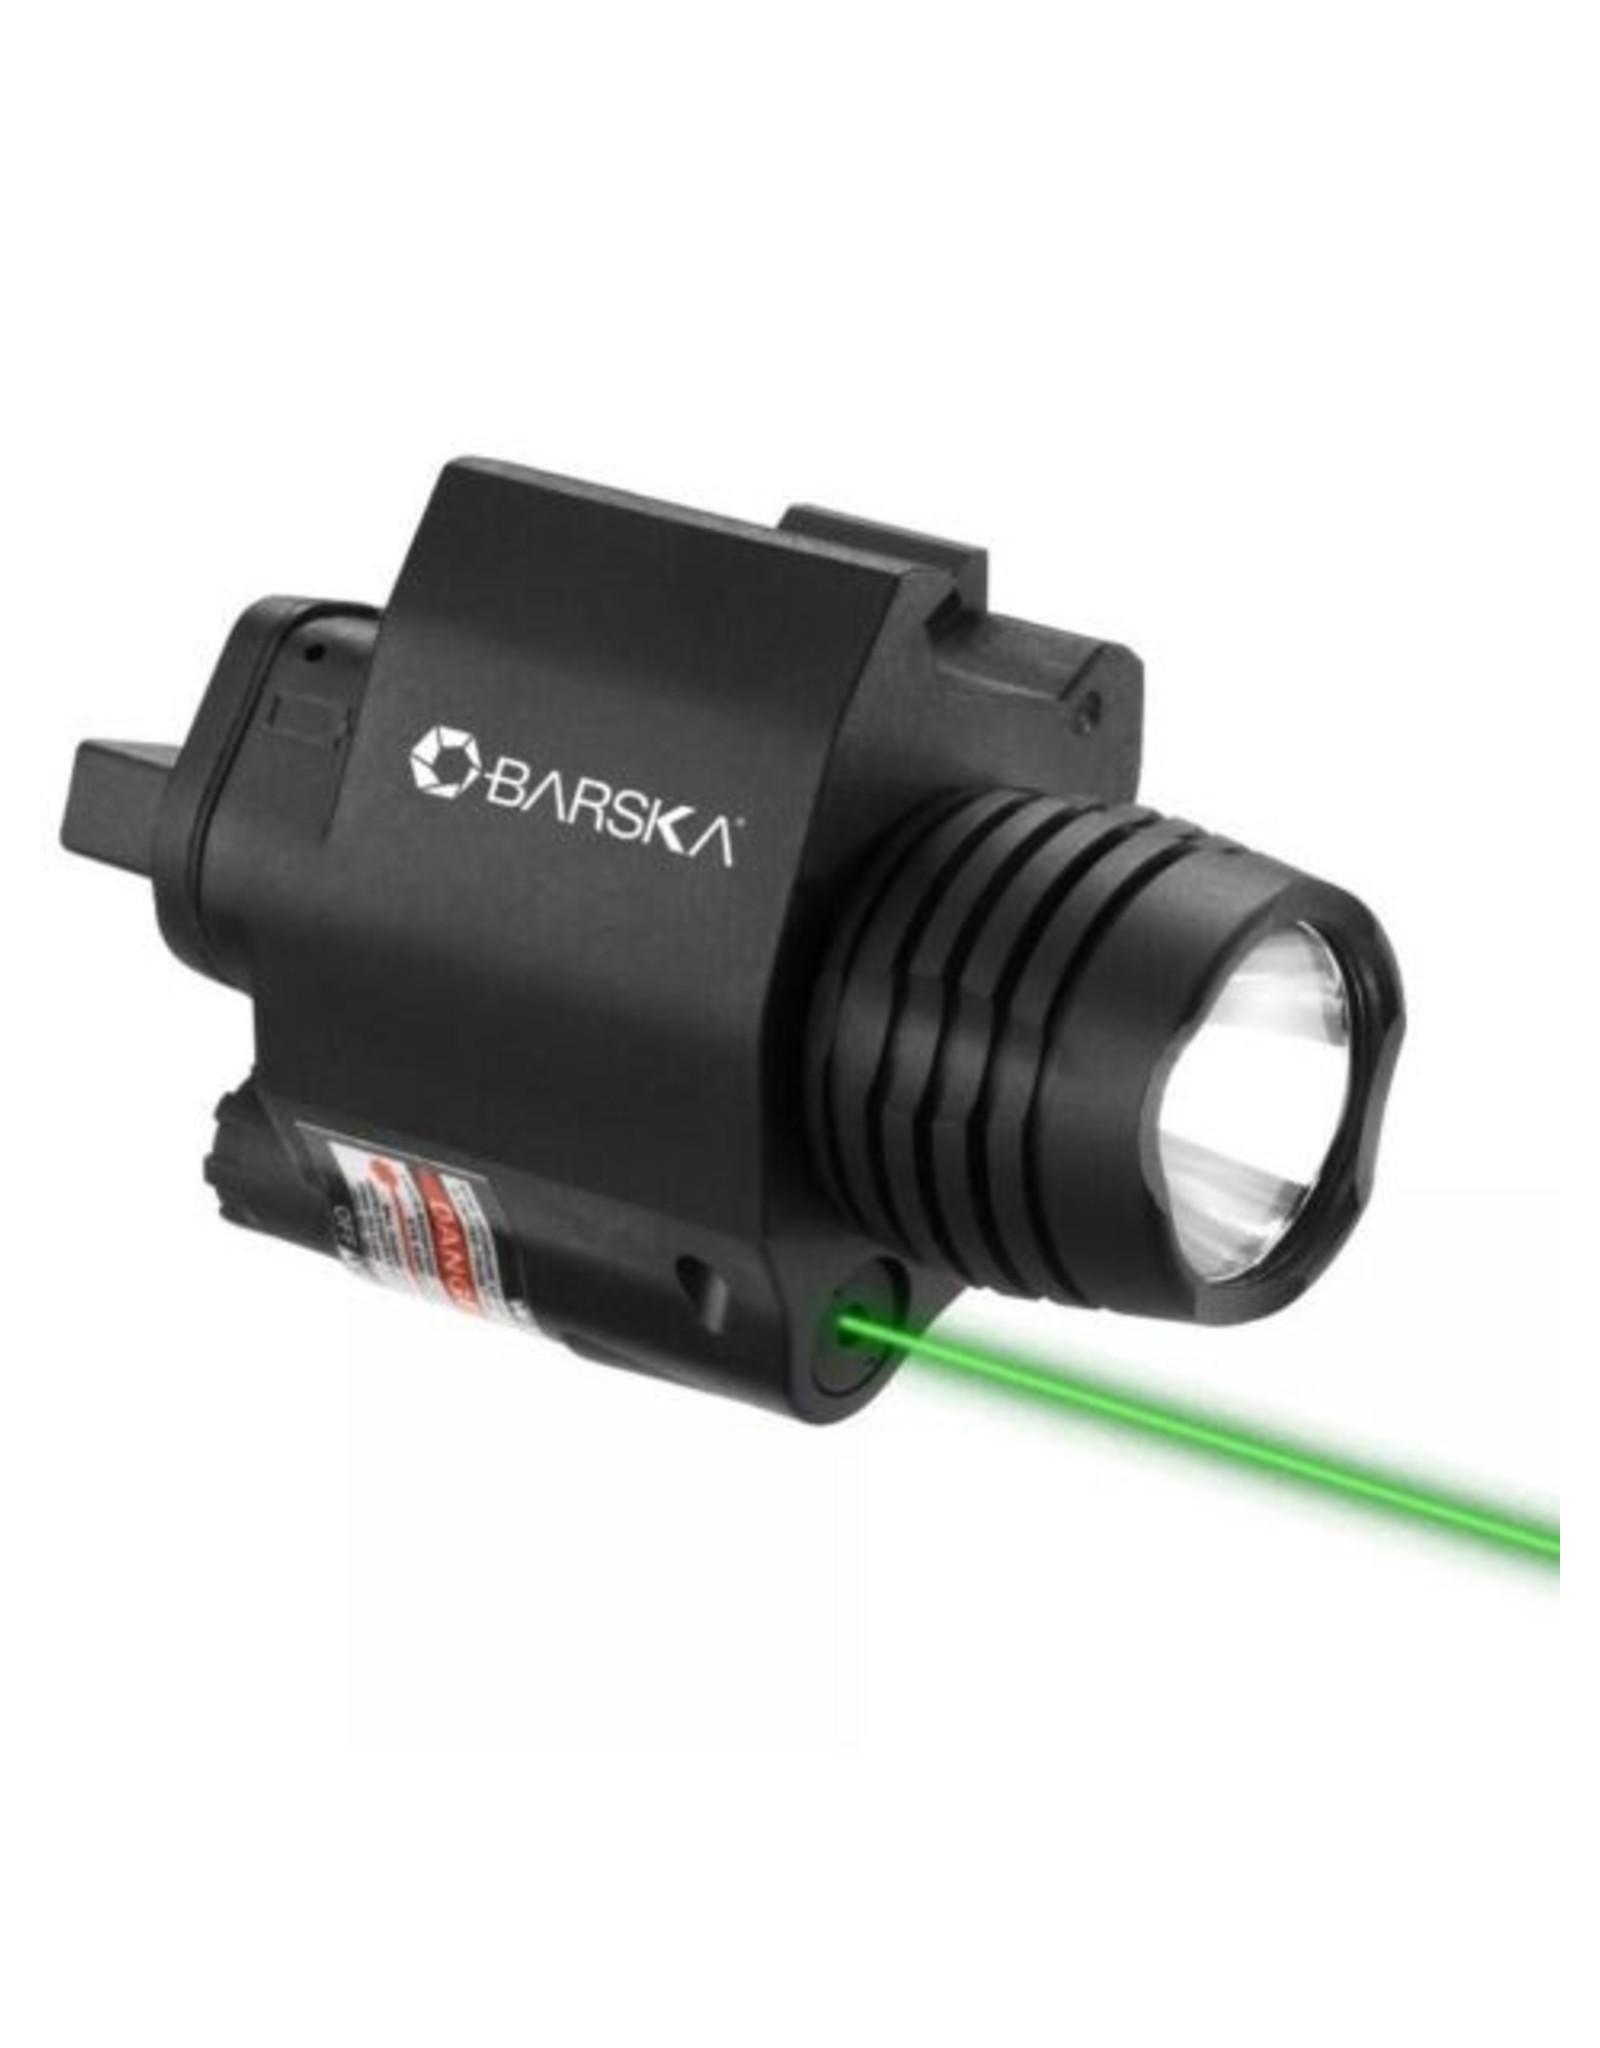 BARSKA OPTICS GREEN LASER WITH 200 LUMEN FLASHLIGHT